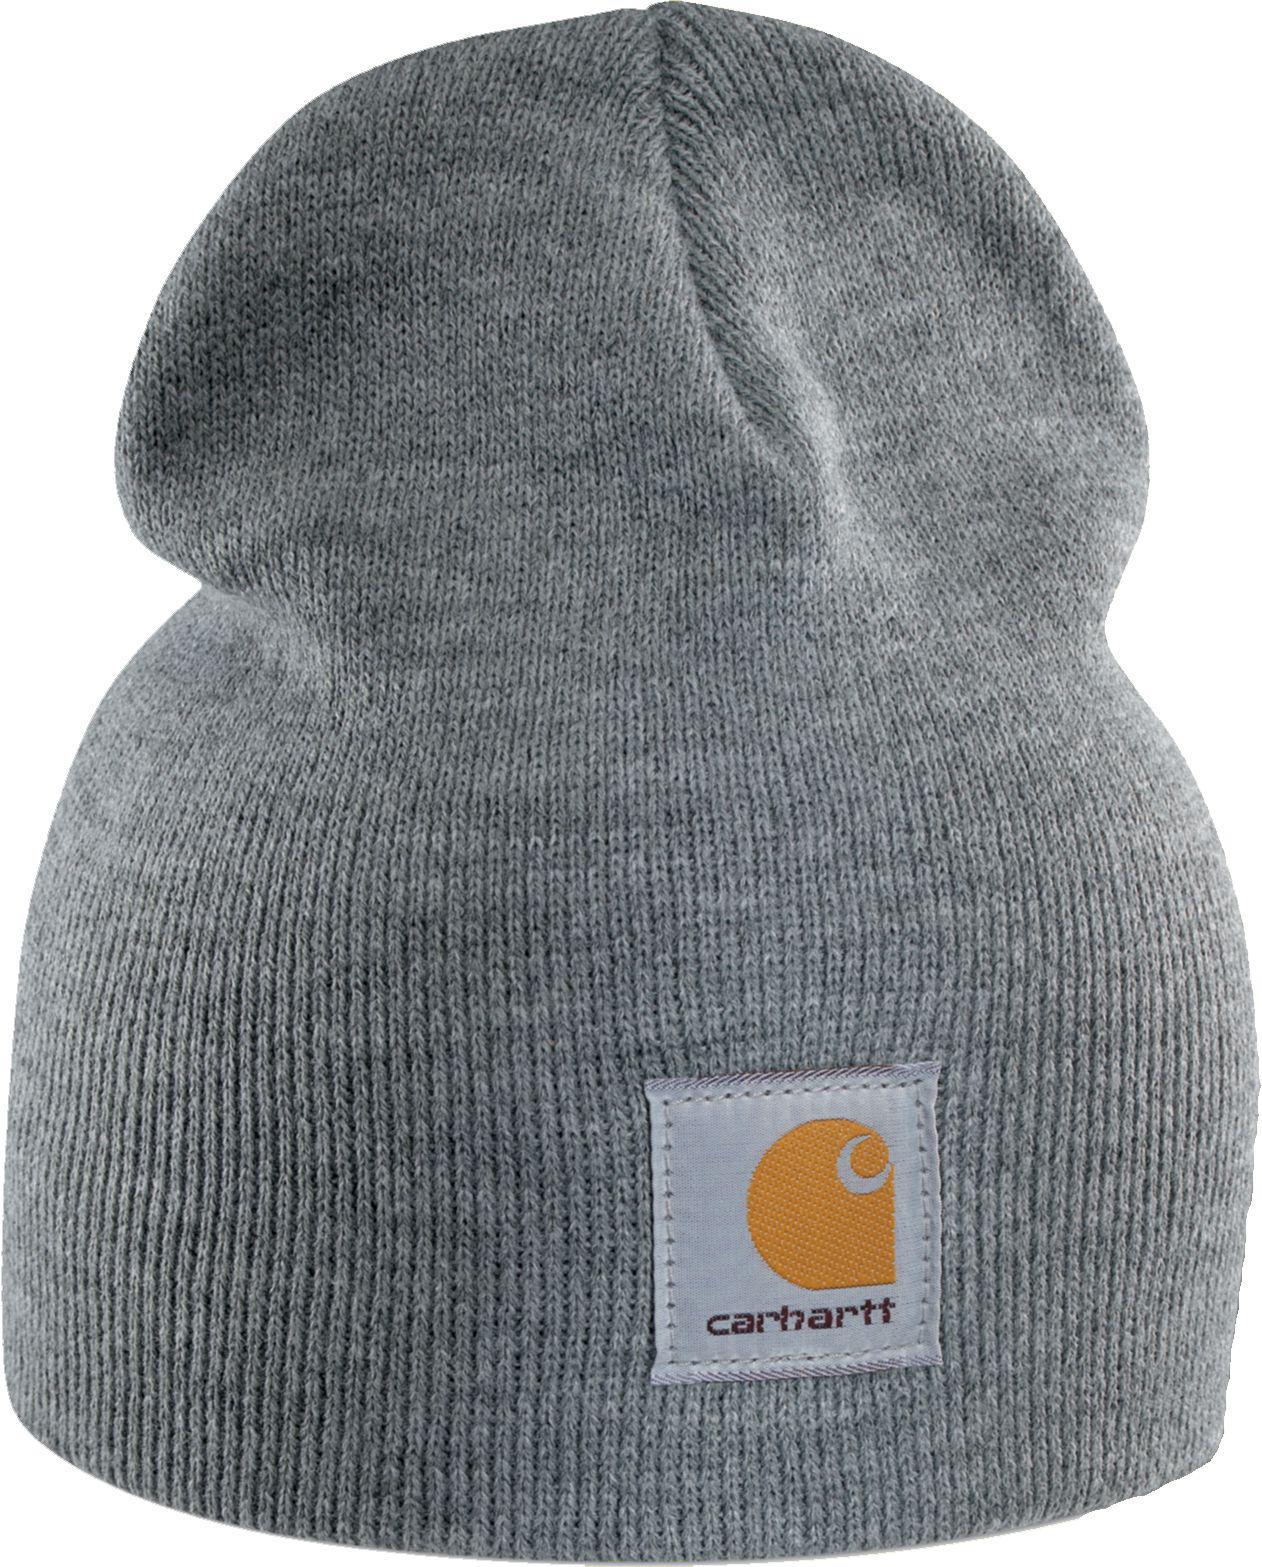 e222bc197f8 Lyst - Carhartt Acrylic Knit Cap in Gray for Men